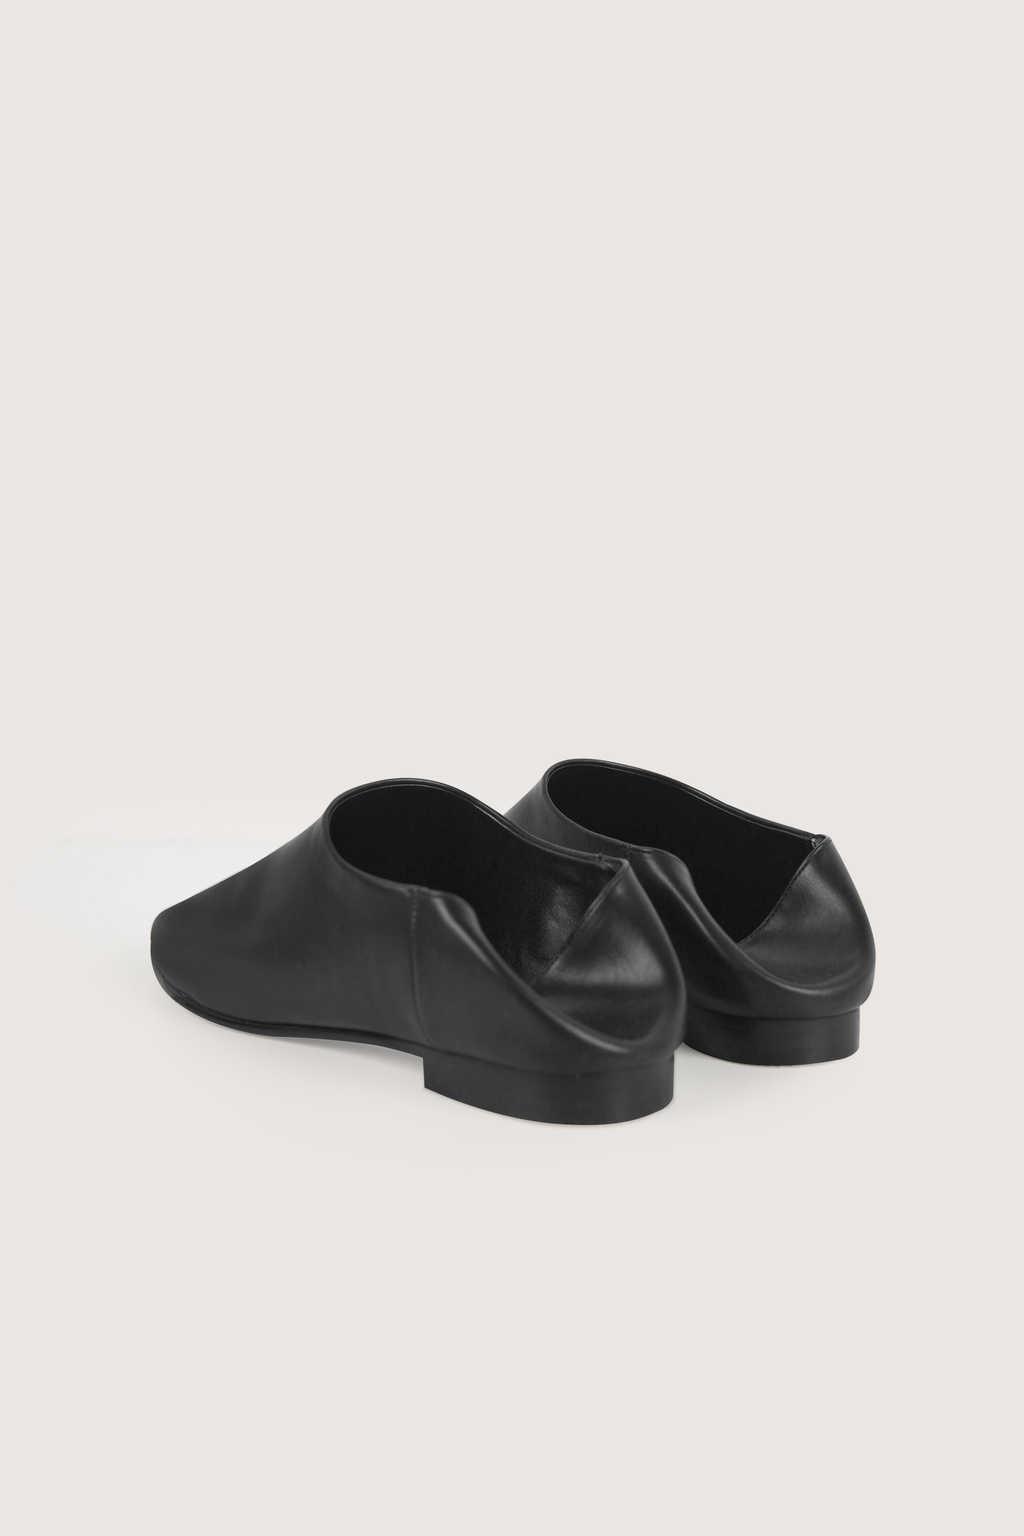 Flat 1627 Black 8